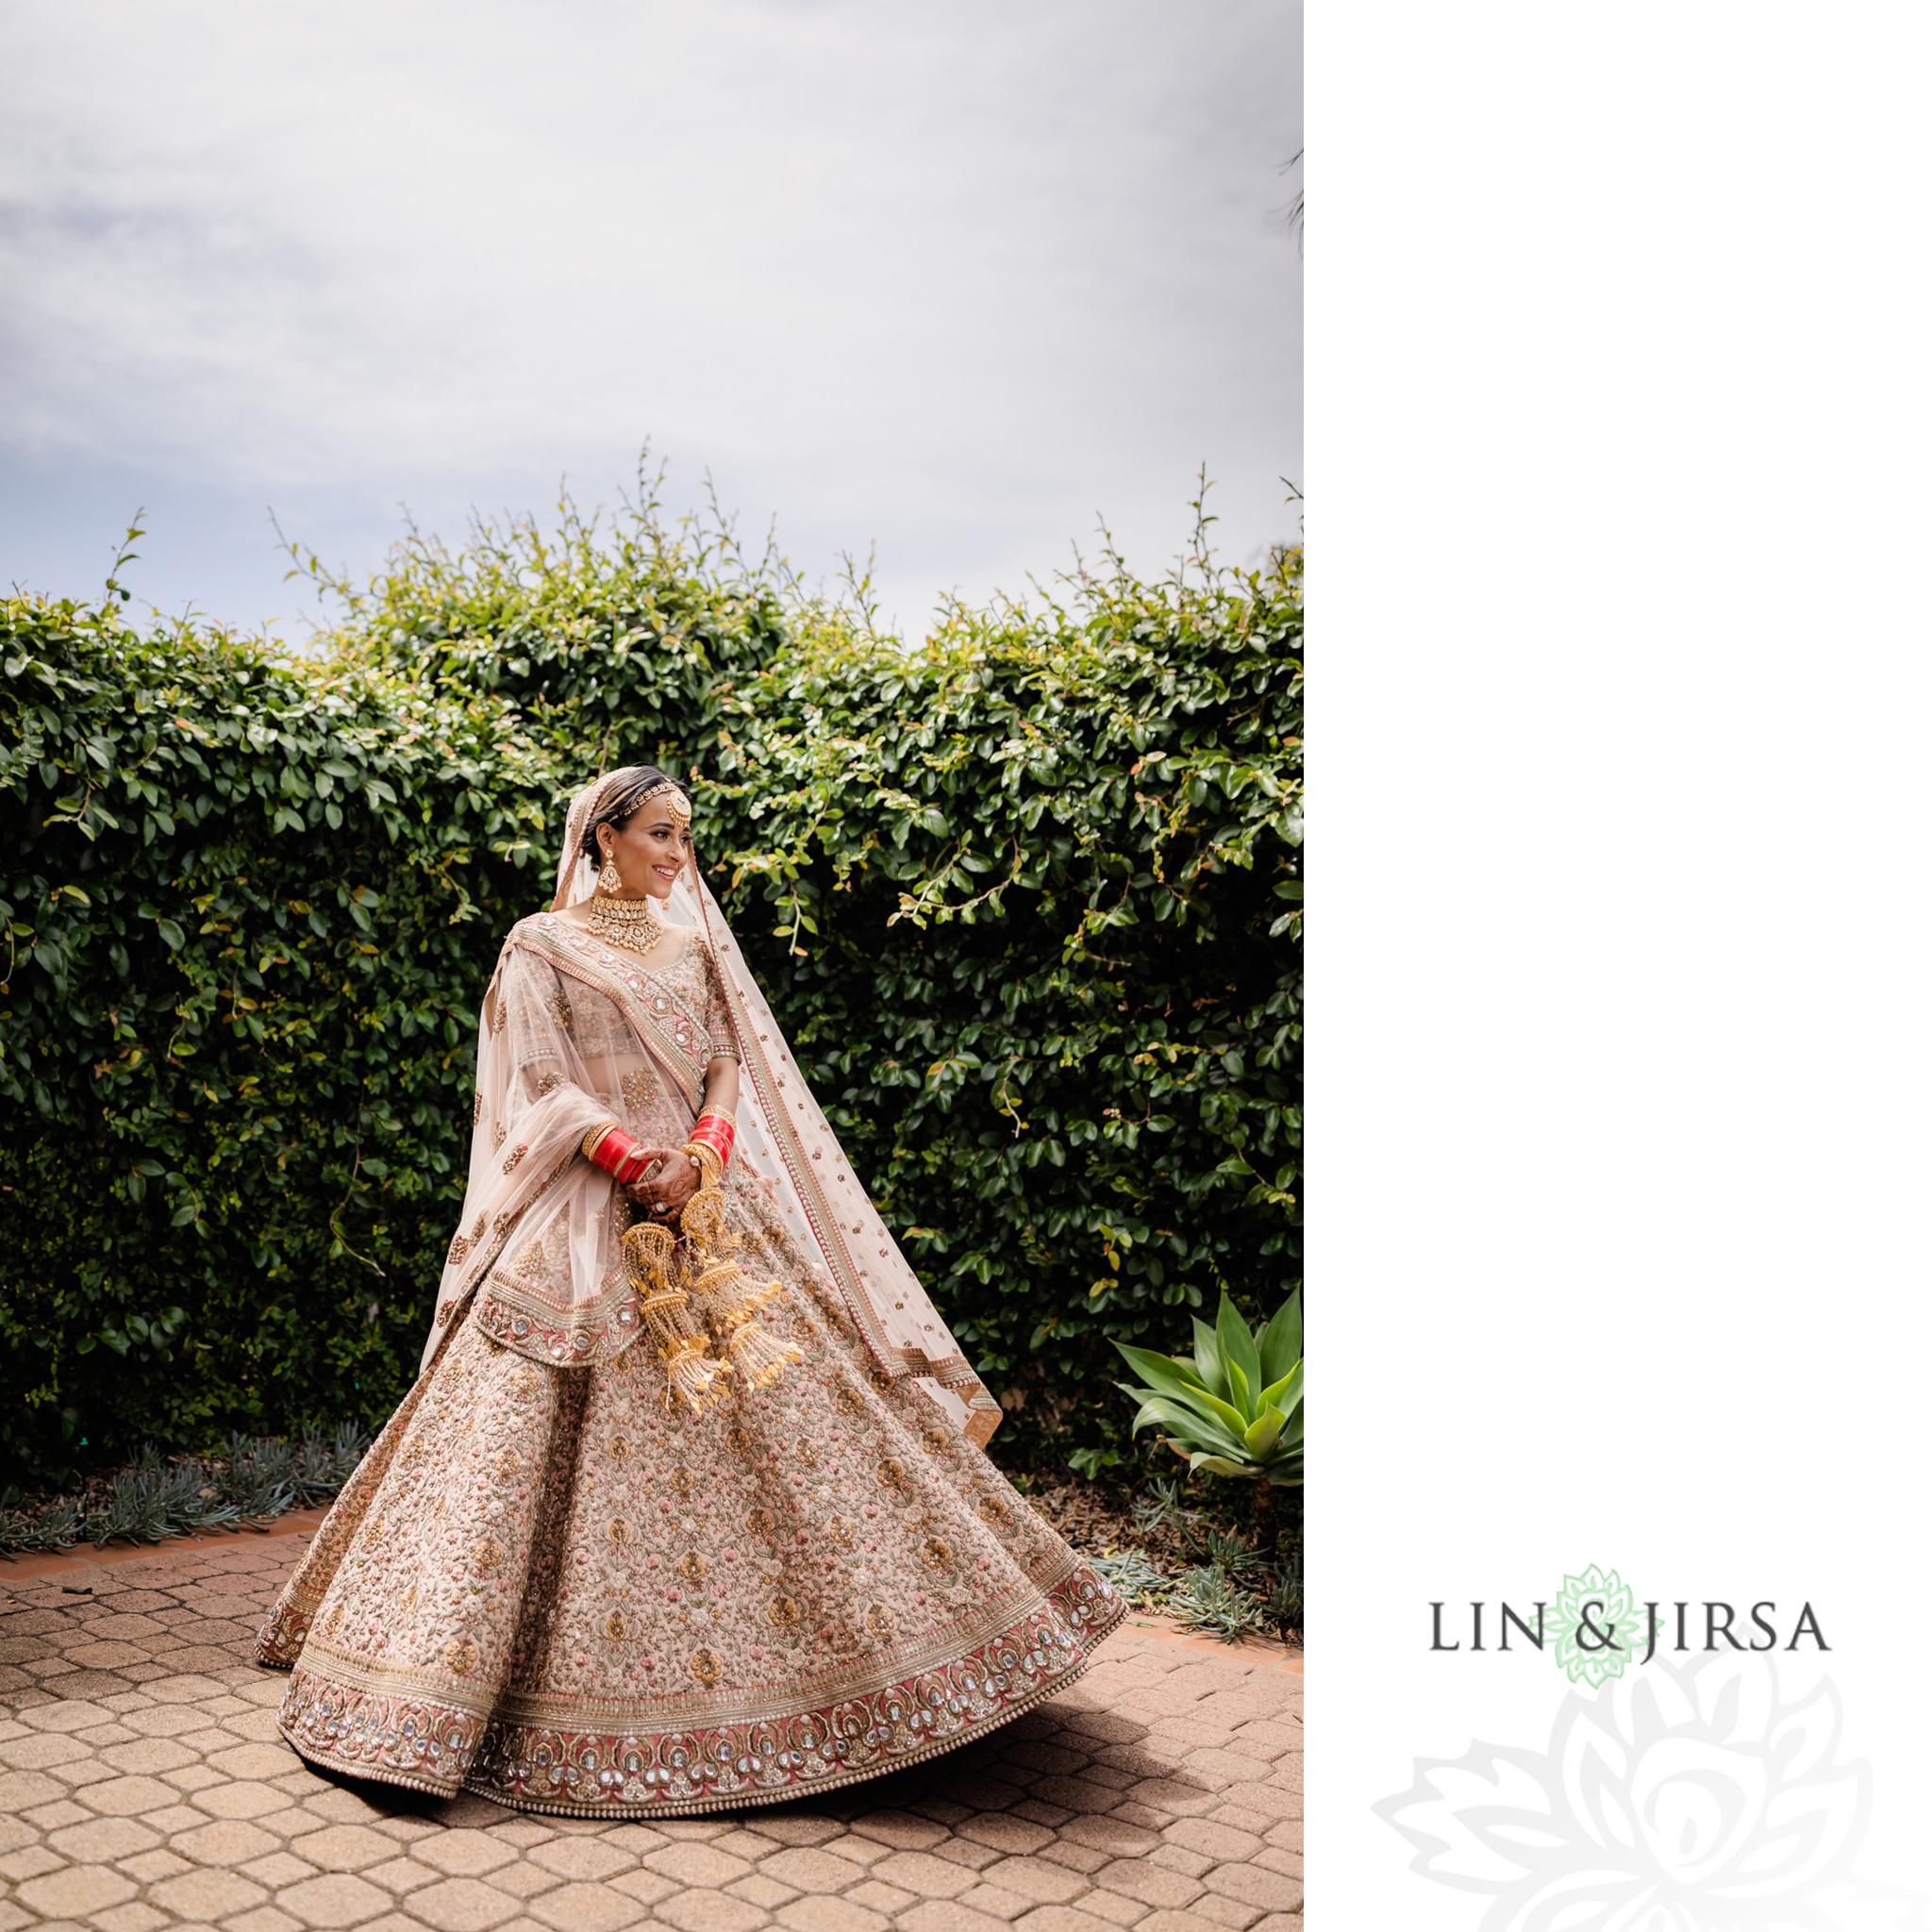 08 Hilton Santa Barbara Beachfront Resort Punjabi Indian Wedding Ceremony Photography